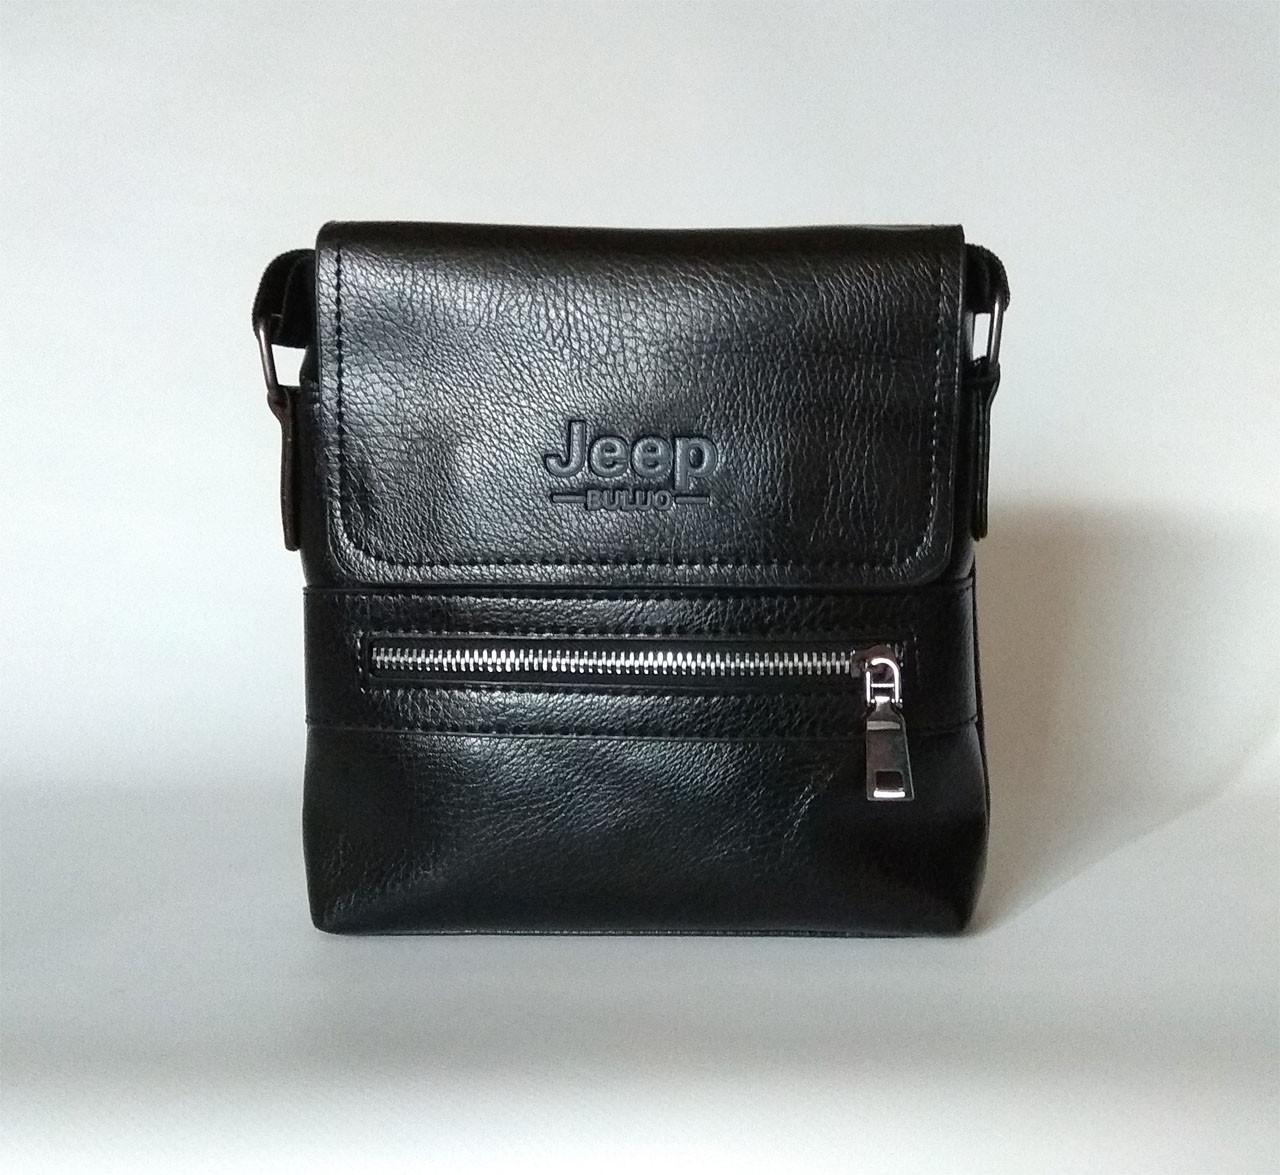 Мужская сумка через плечо в стиле Jeep. Черная. 21см х 19см / Кожа PU. 558 black